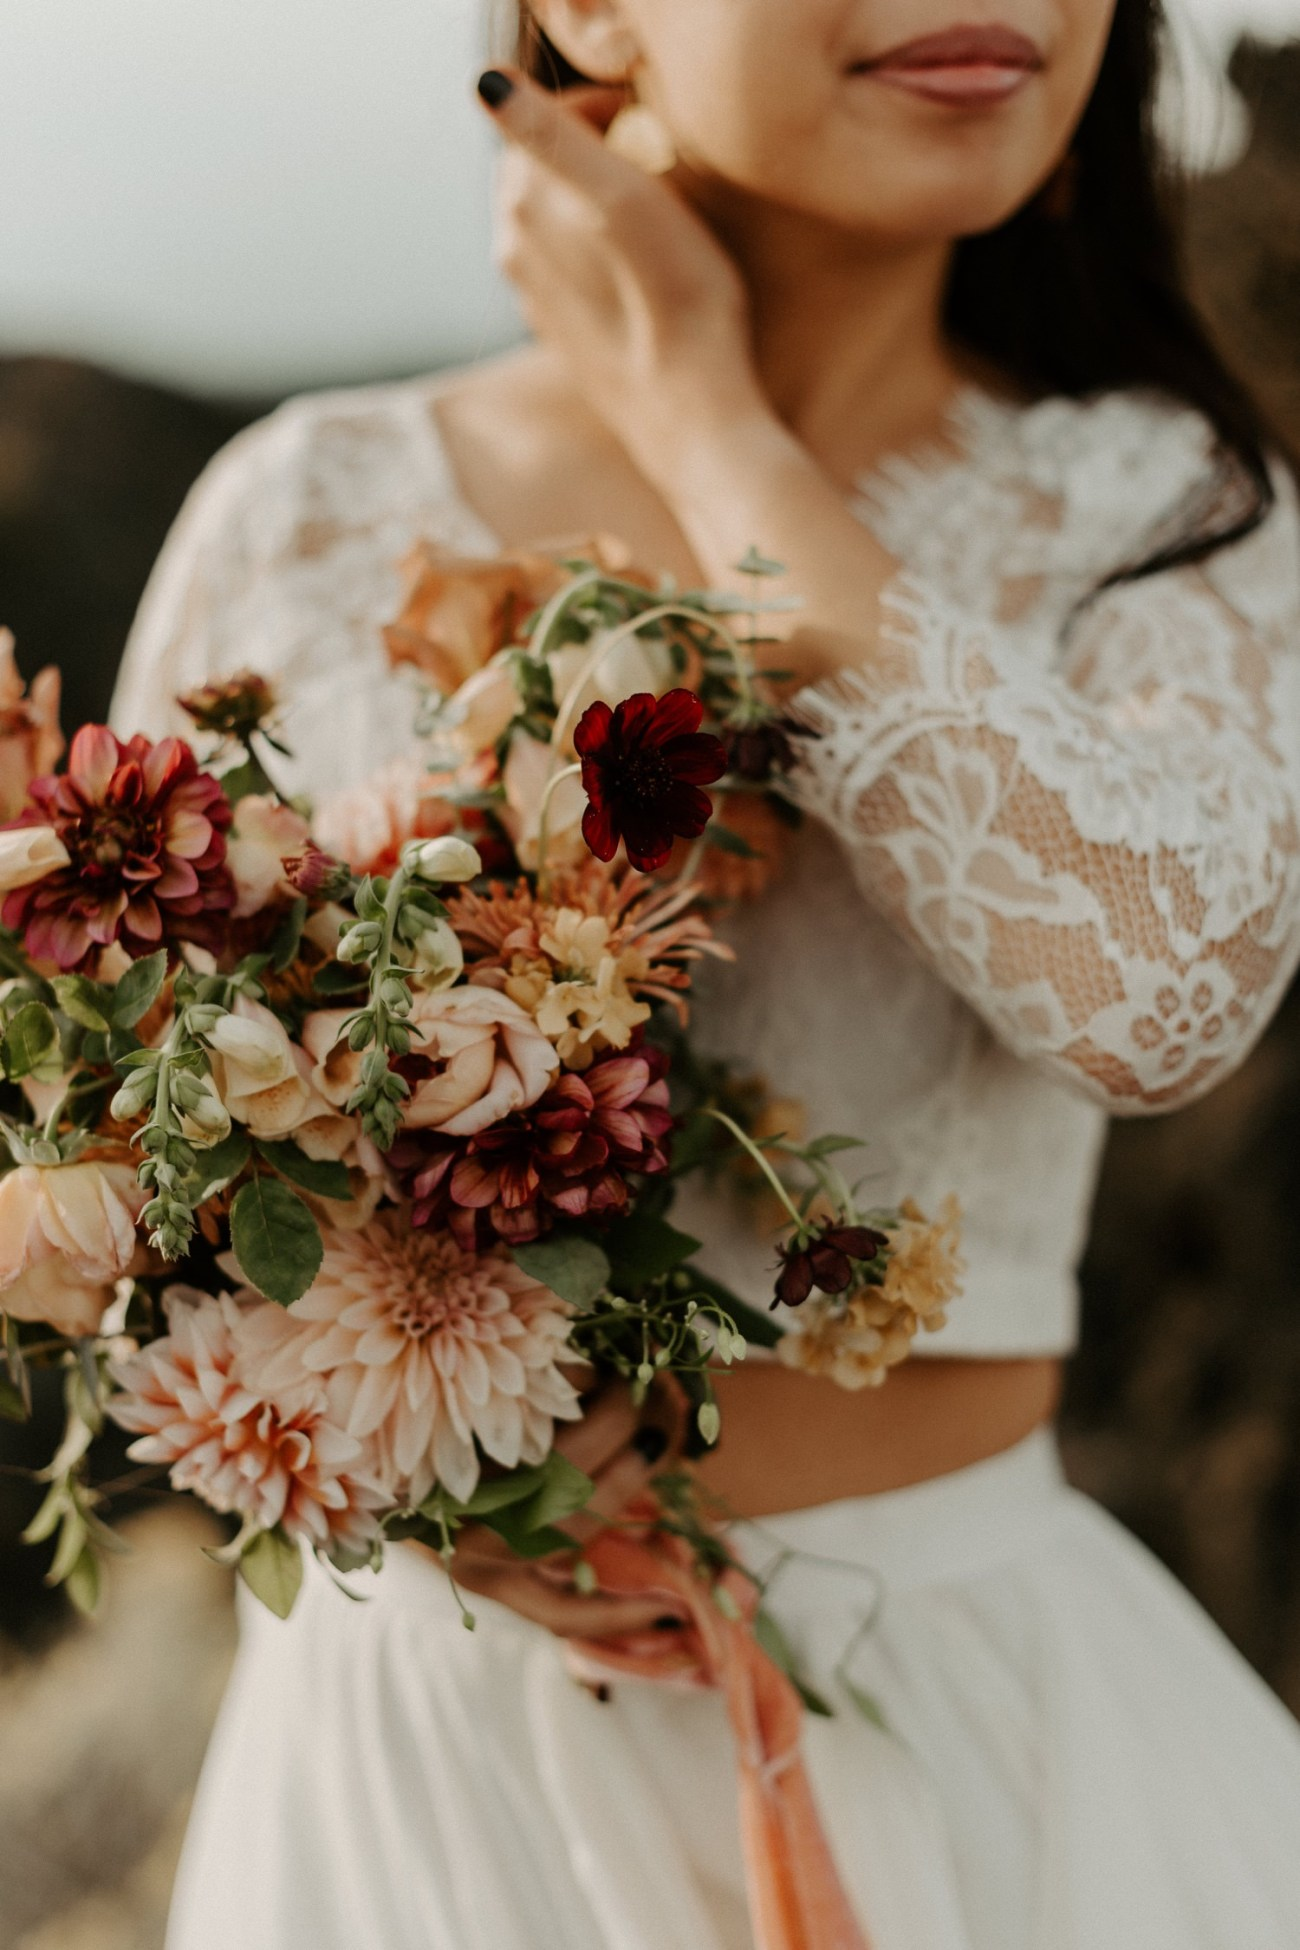 Newberry Volcano Elopement Bend Elopement Bridal Session Bend Wedding Photographer Anais Possamai Photography 029